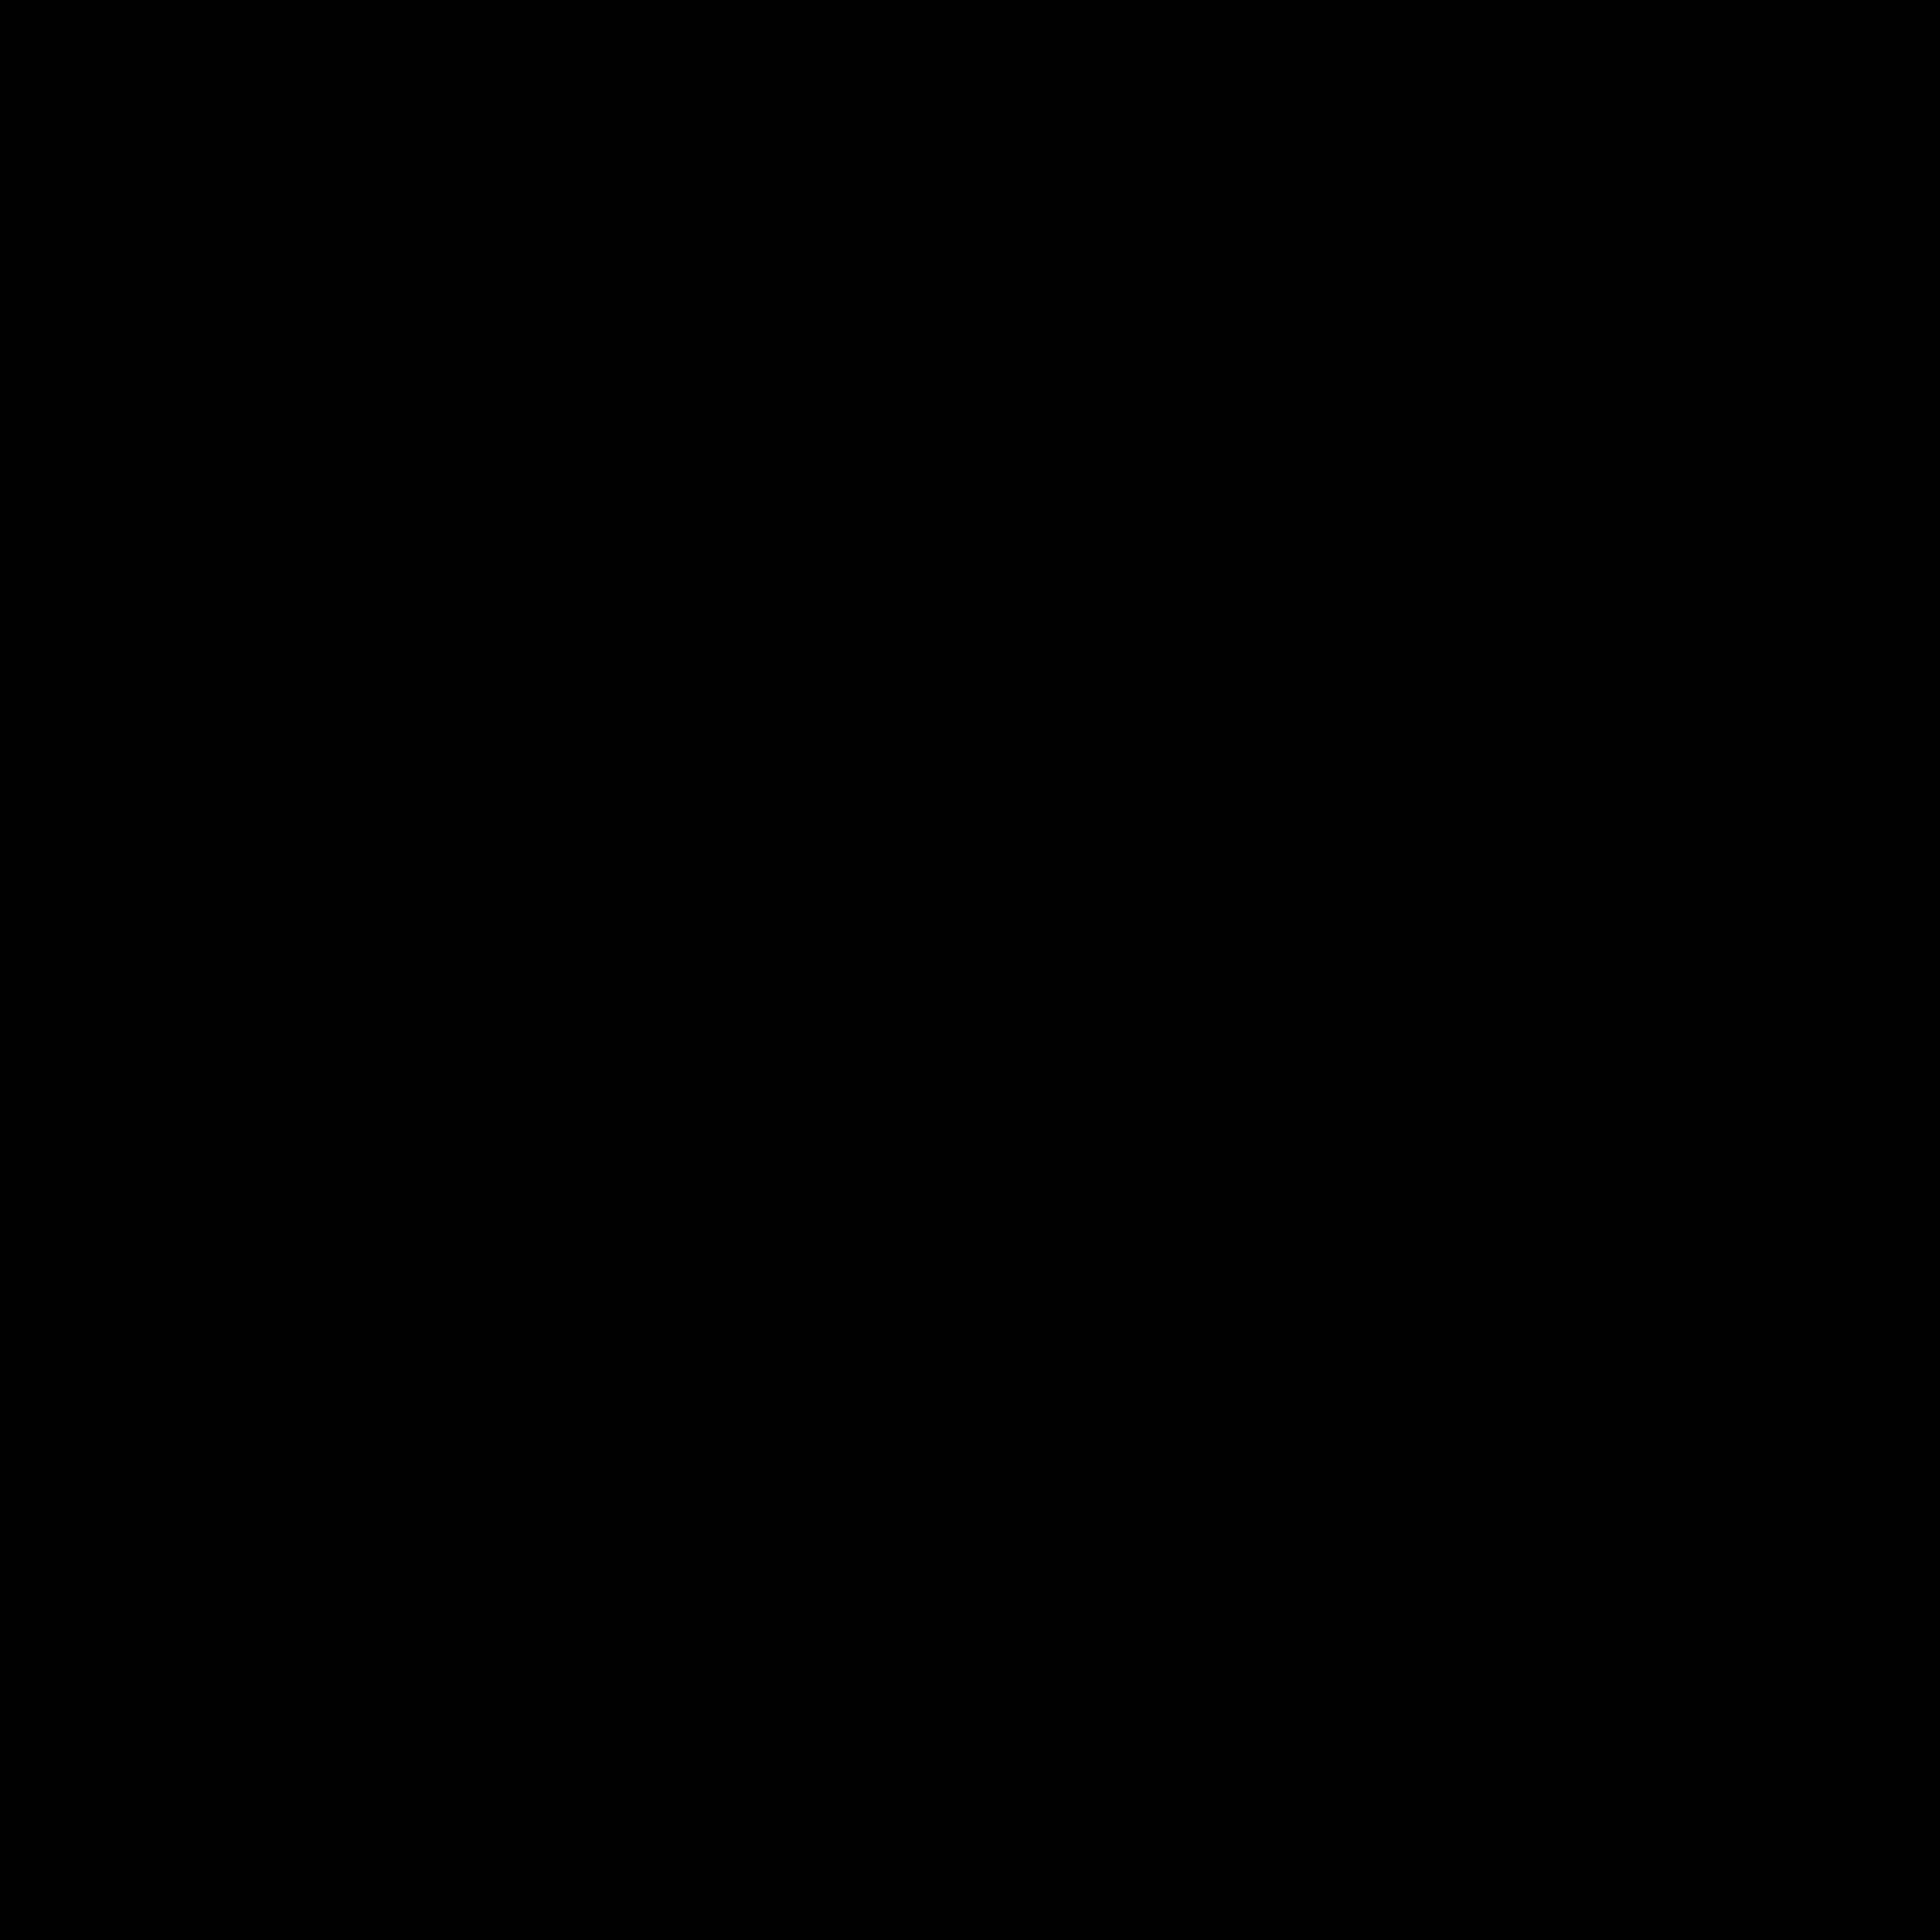 eventstore, black icon